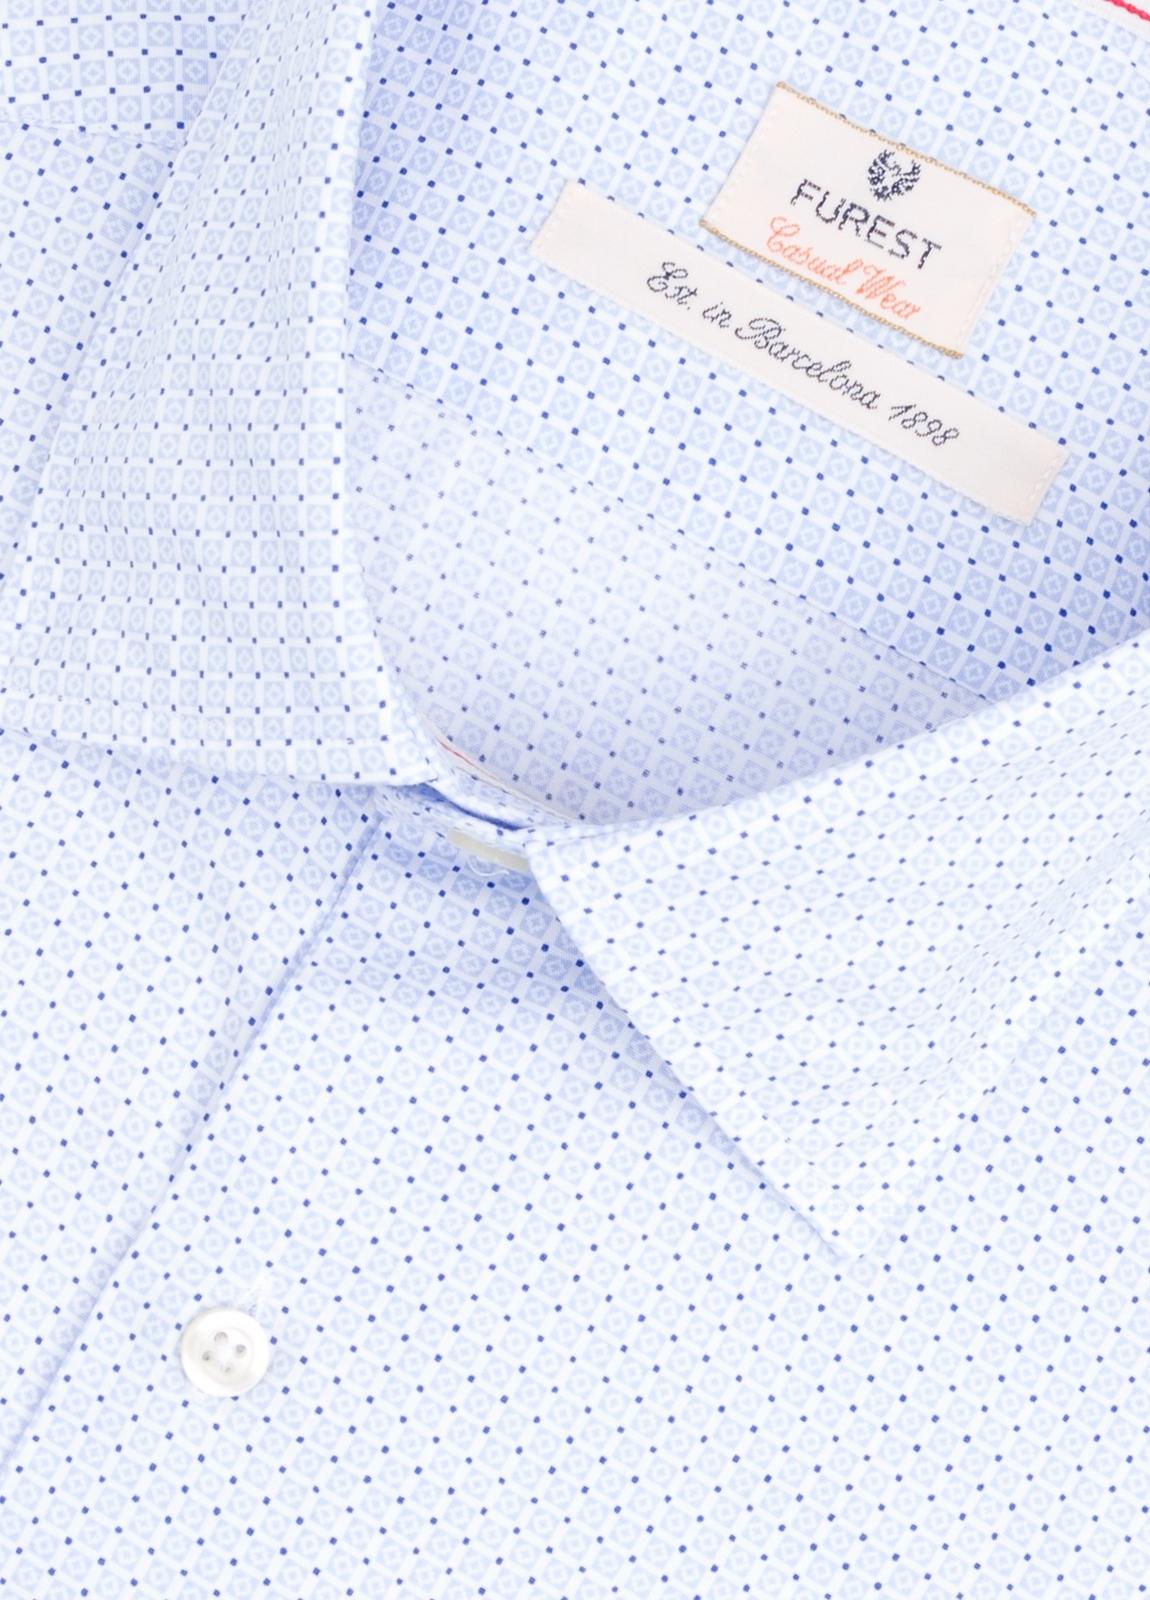 Camisa Casual Wear SLIM FIT Modelo PORTO microdibujo color azul.100% Algodón. - Ítem1